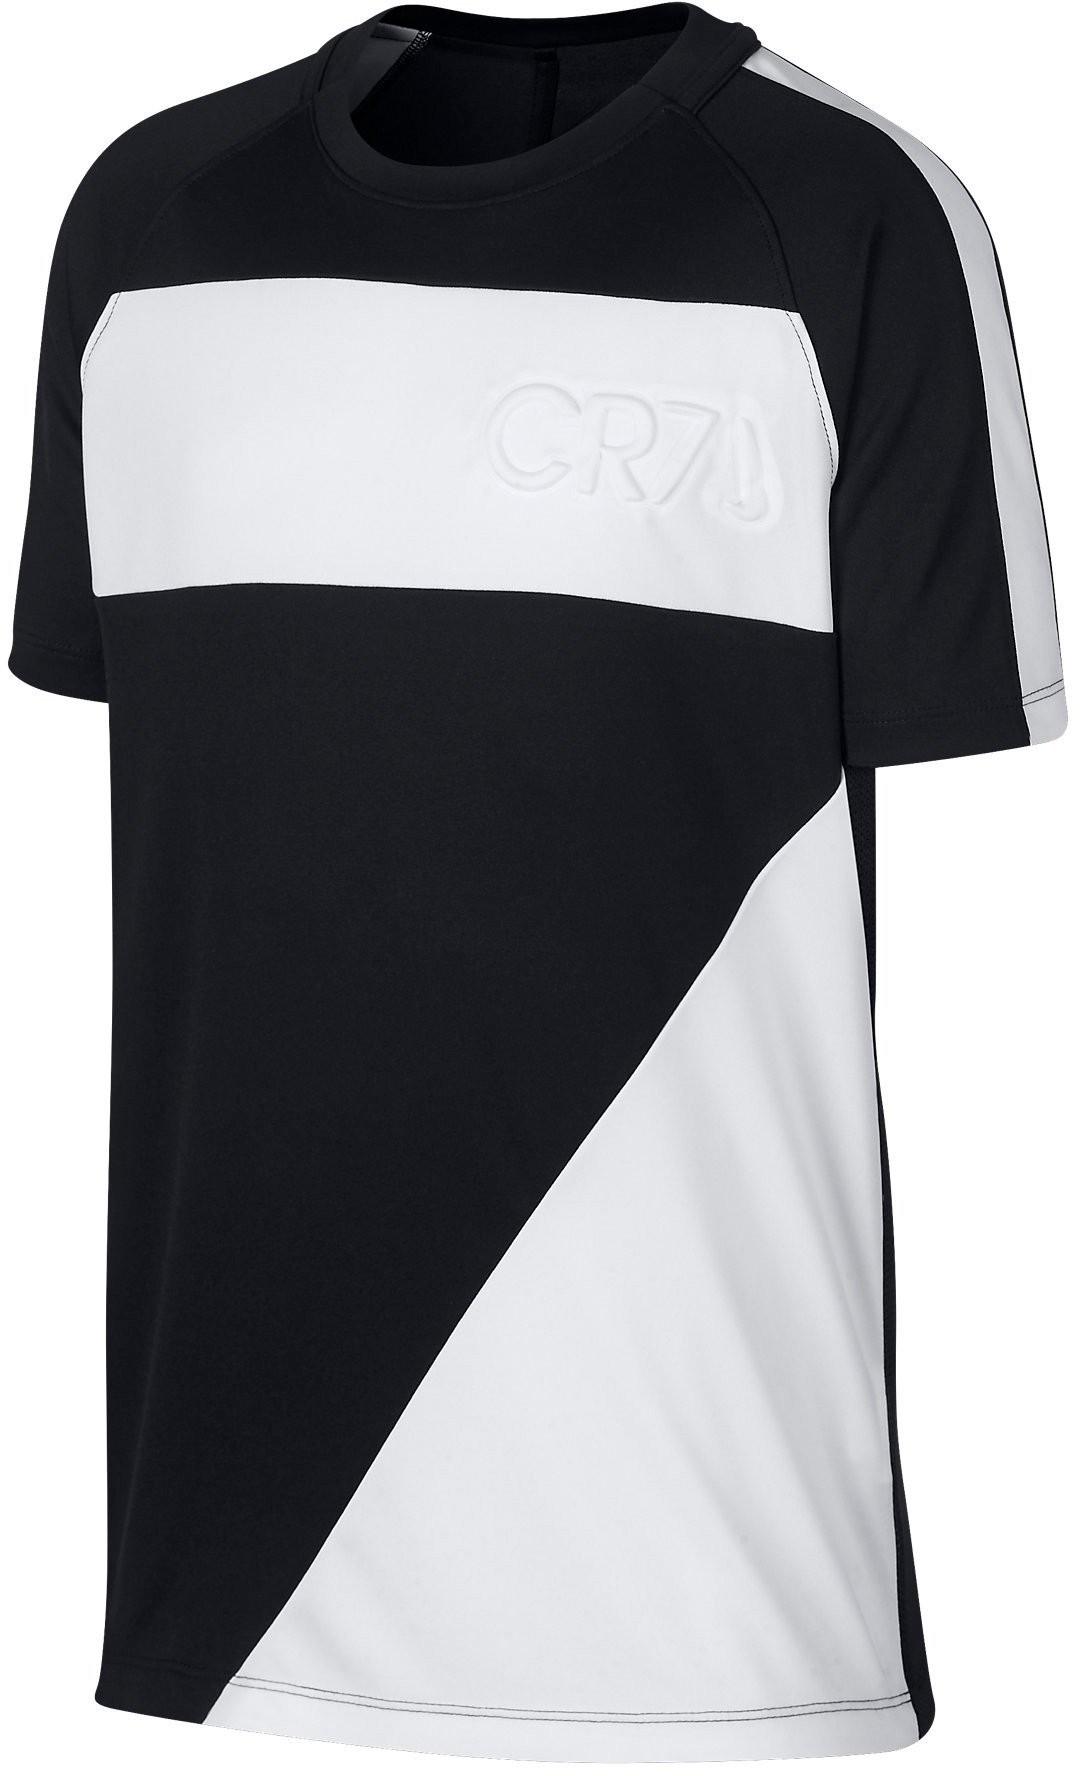 Camiseta Nike Dri-Fit CR7  a372809302f76